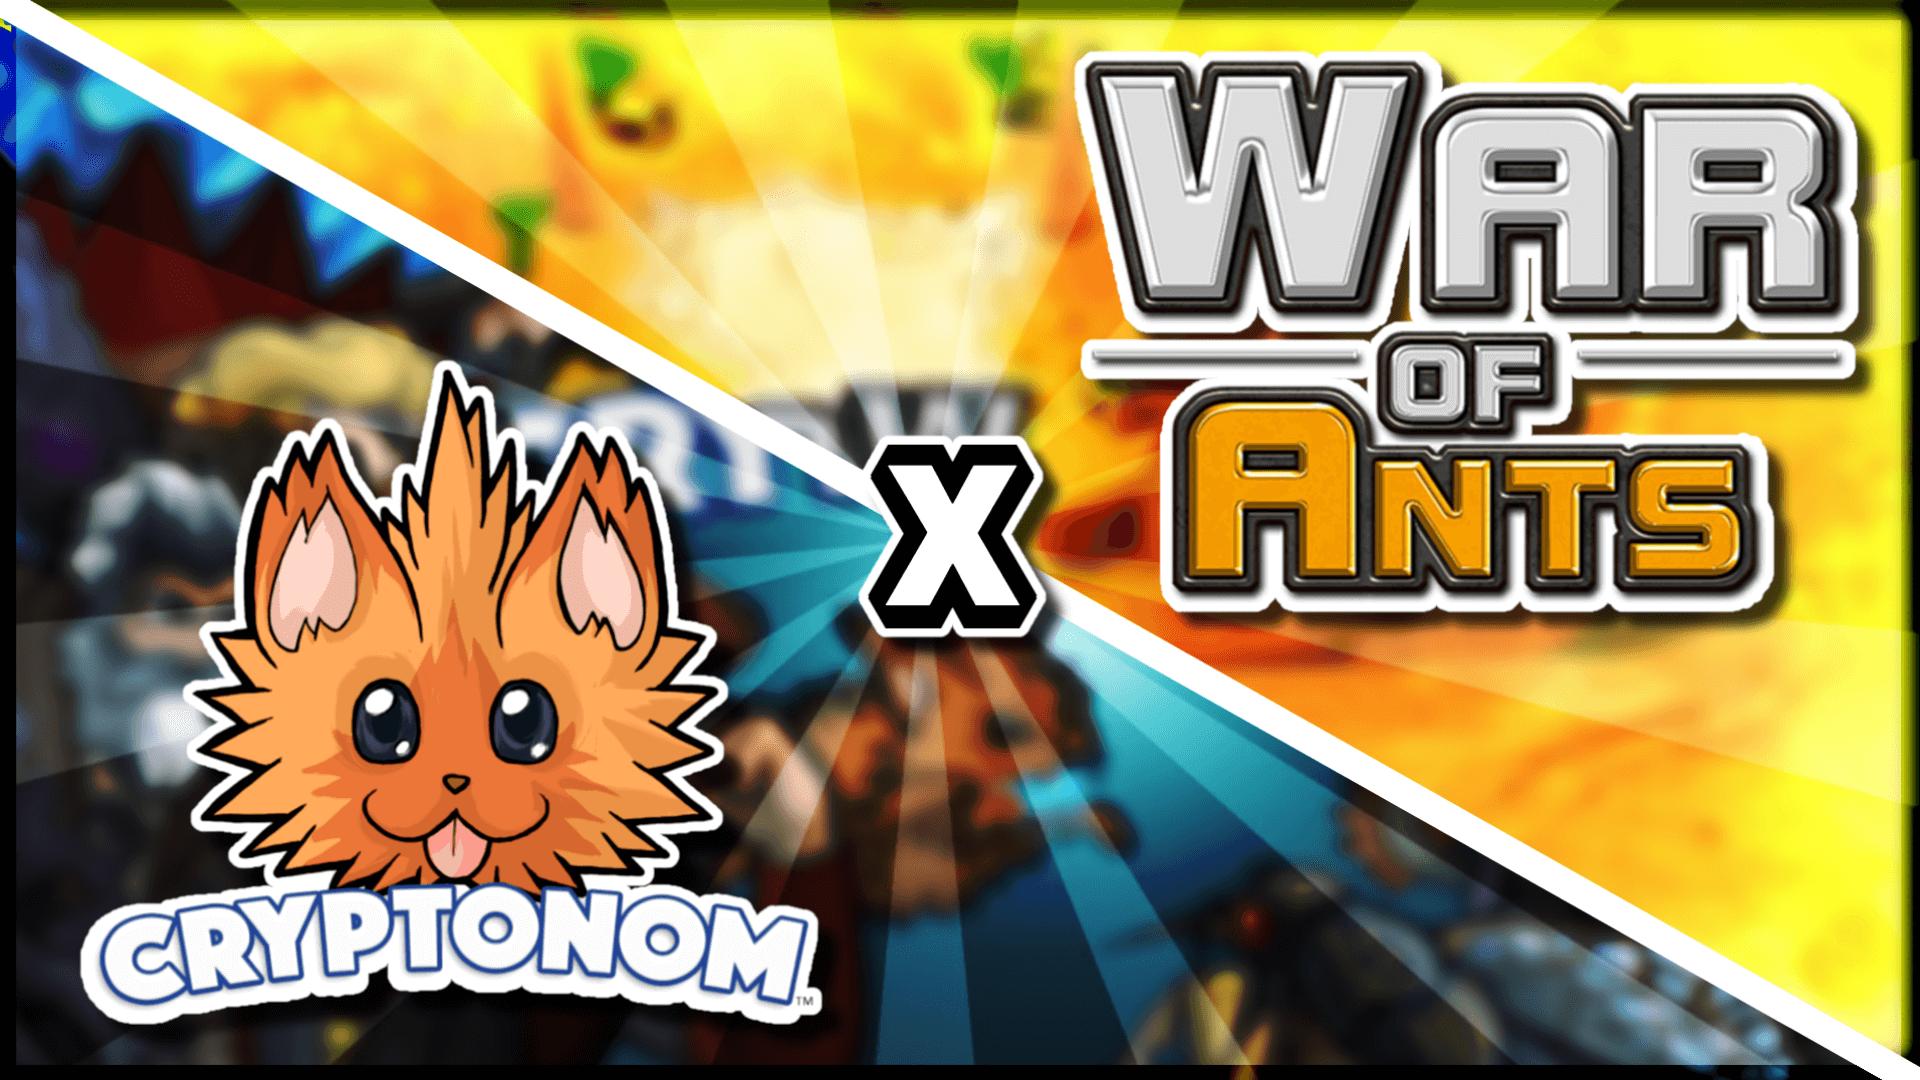 War of Ants x Cryptonom NFT Collab